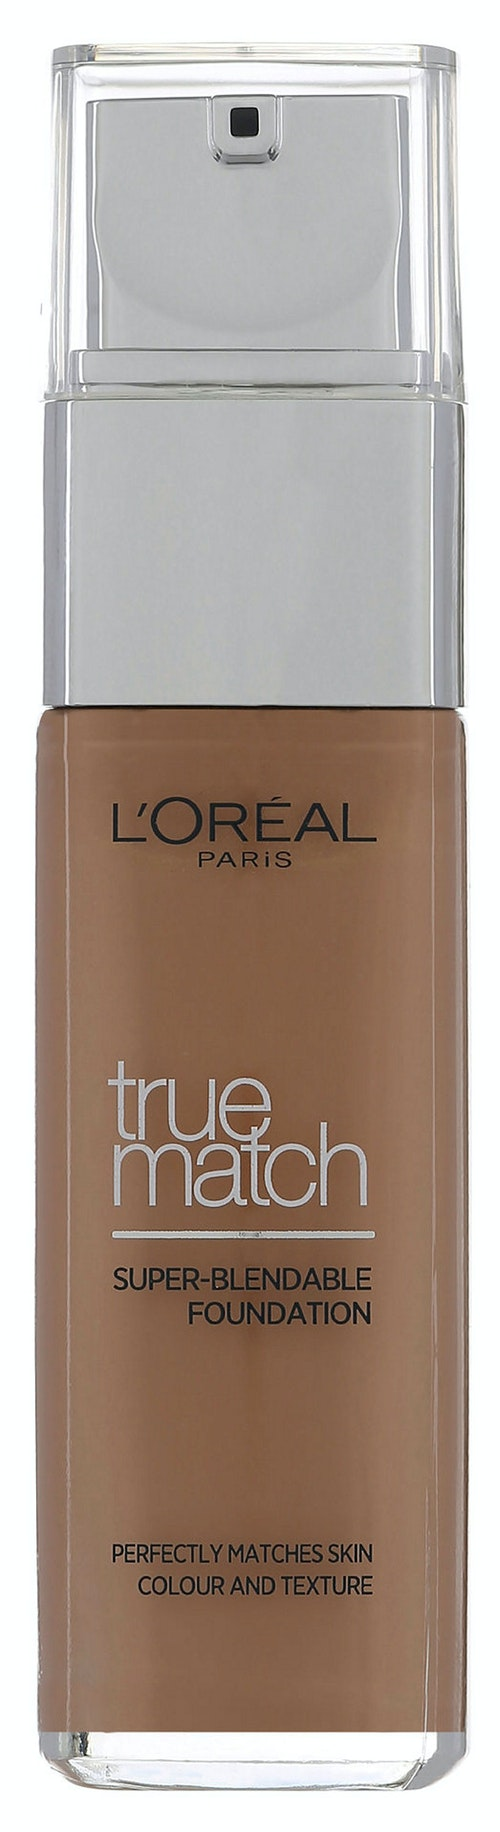 L'Oreal True Match Sand Gold 5D/5W Foundation 1 stk